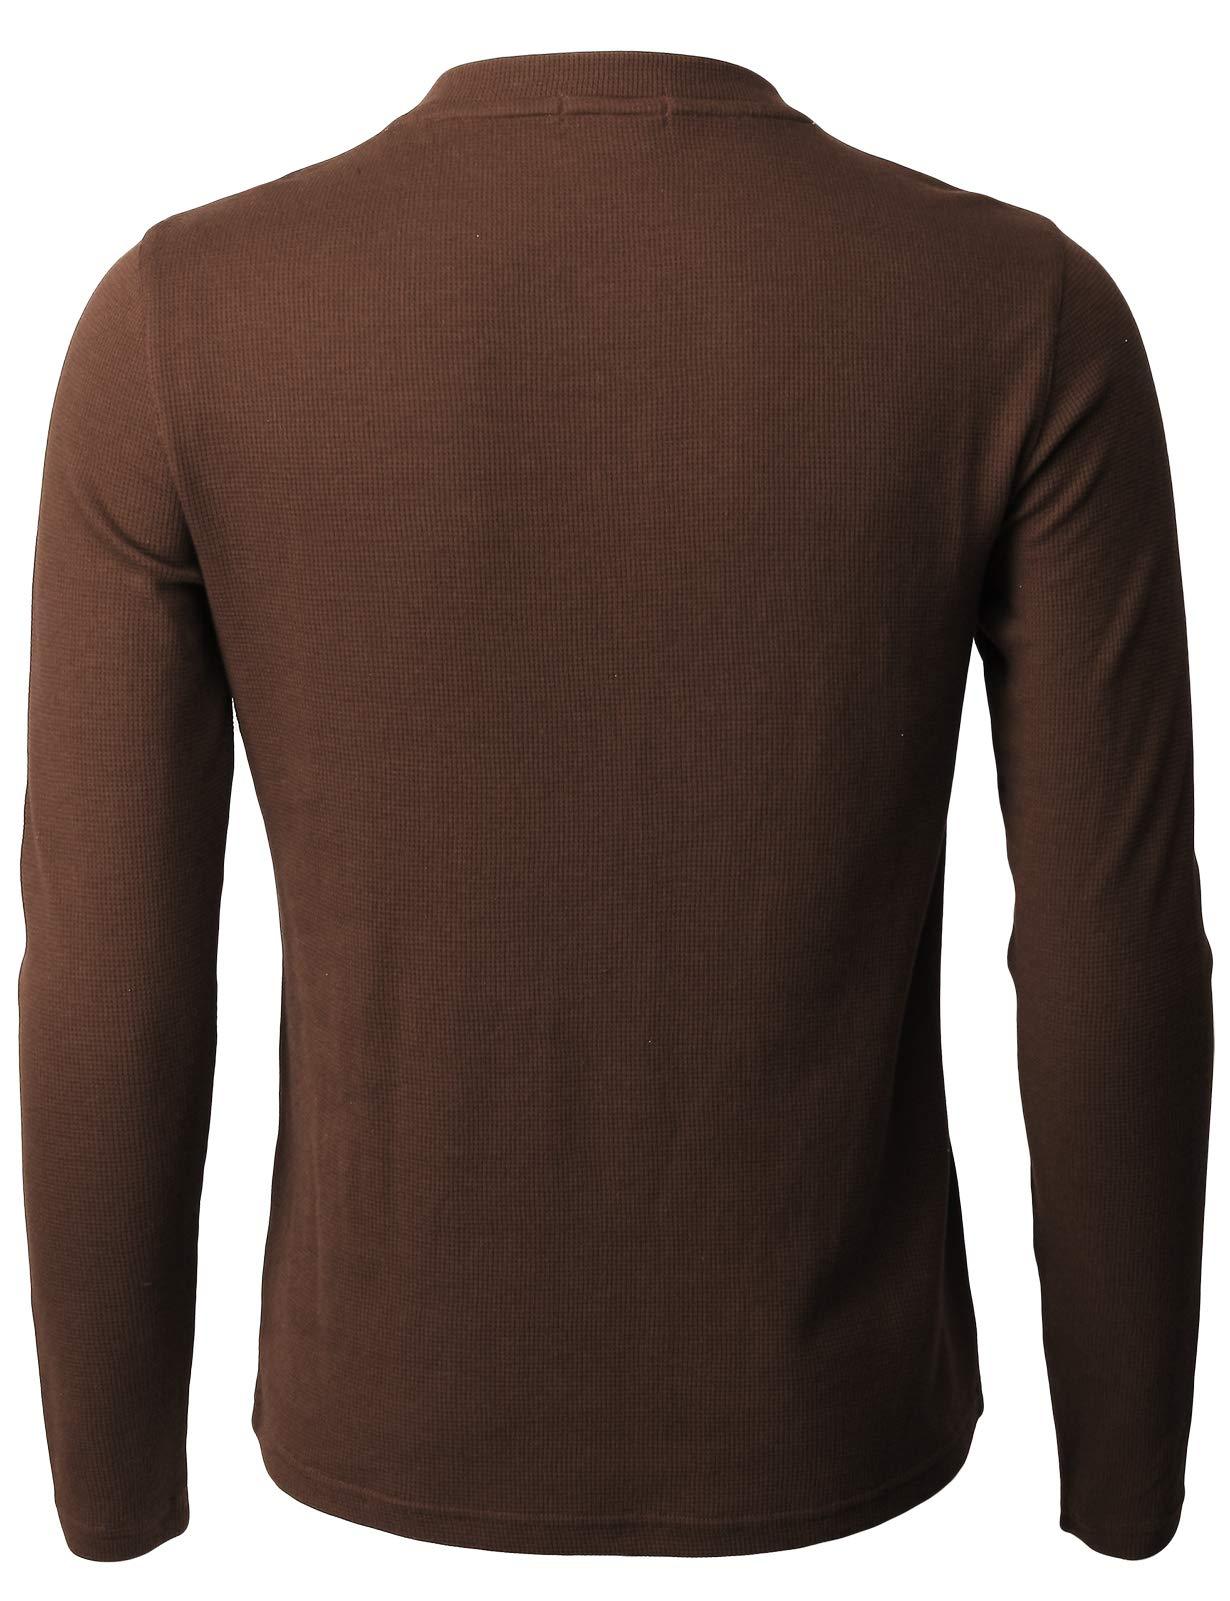 Pishon Mens Plain Henley Shirts Long Sleeve Slim Fit Button Casual V-neck Tee Shirts